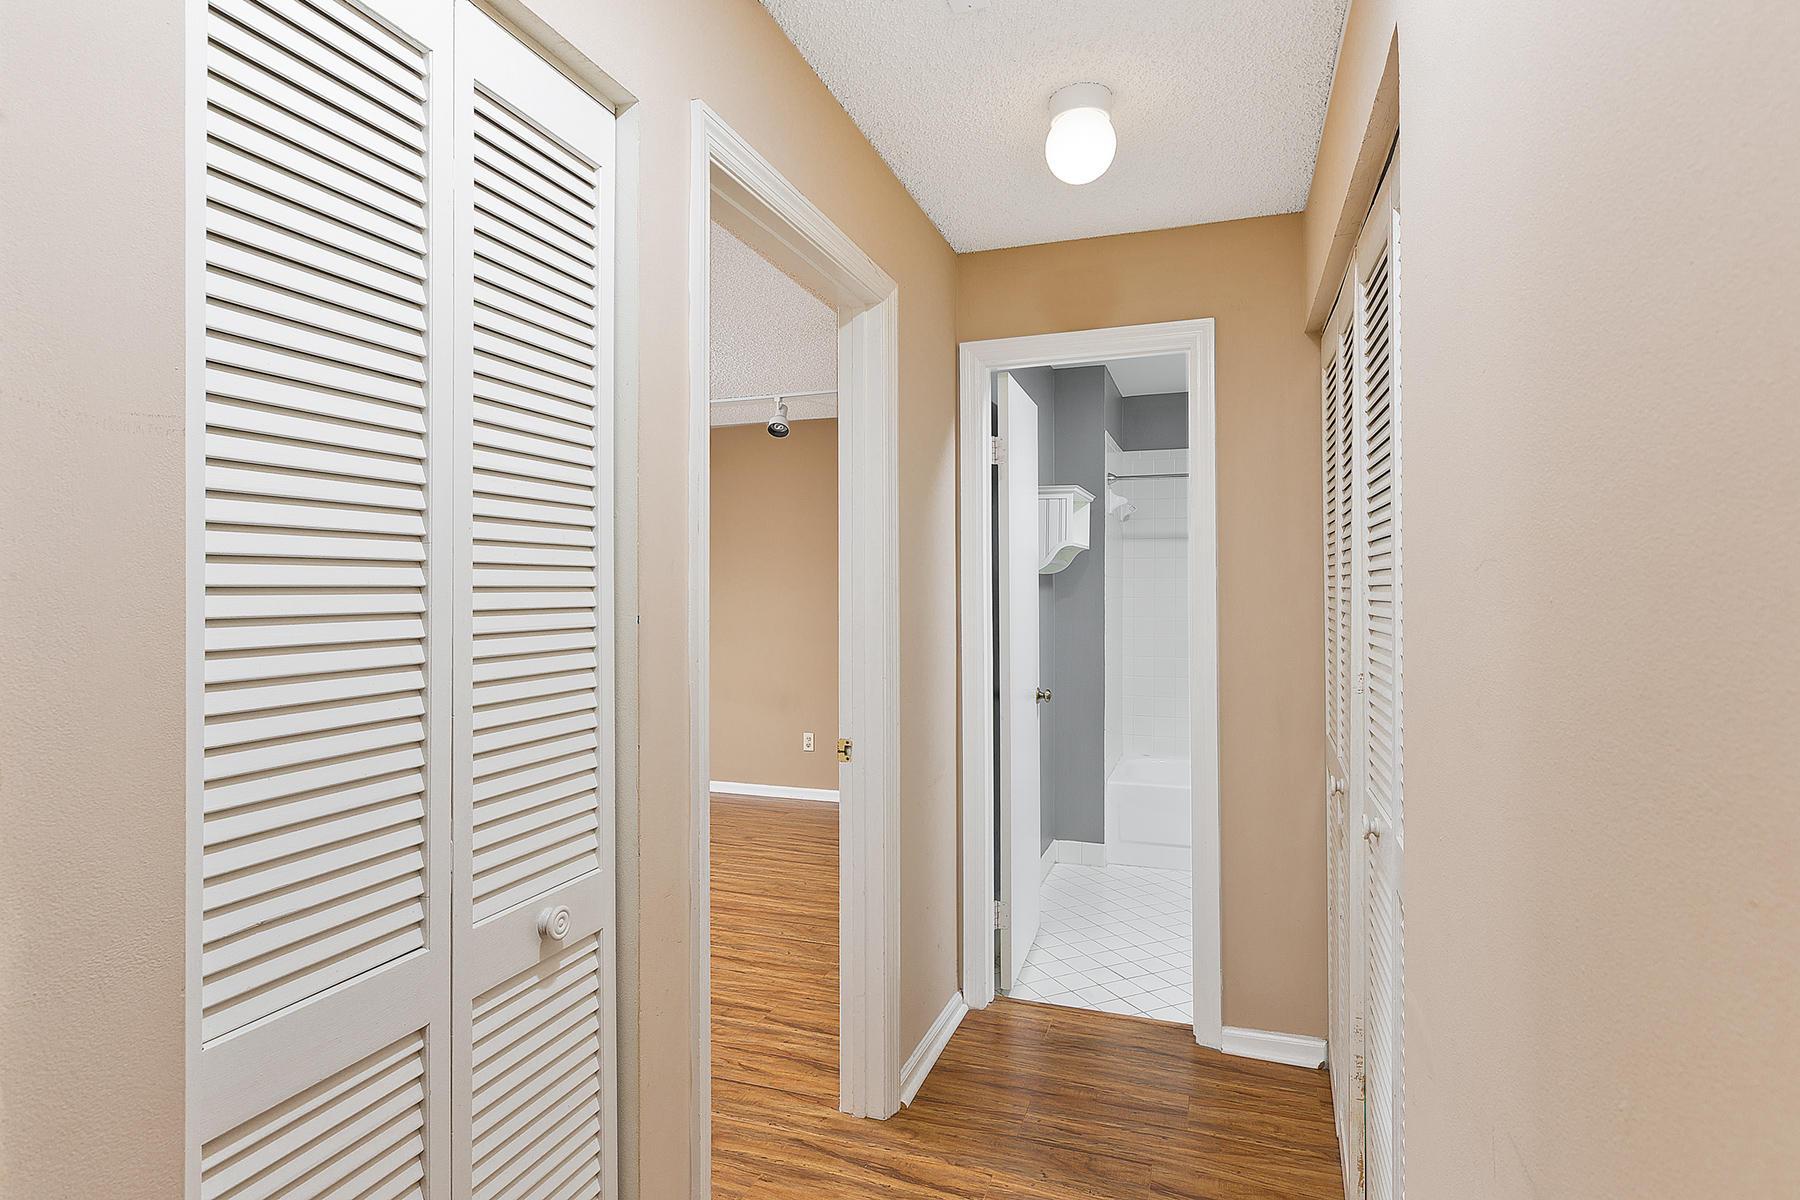 18_Hallway_Secondary-Bedroom